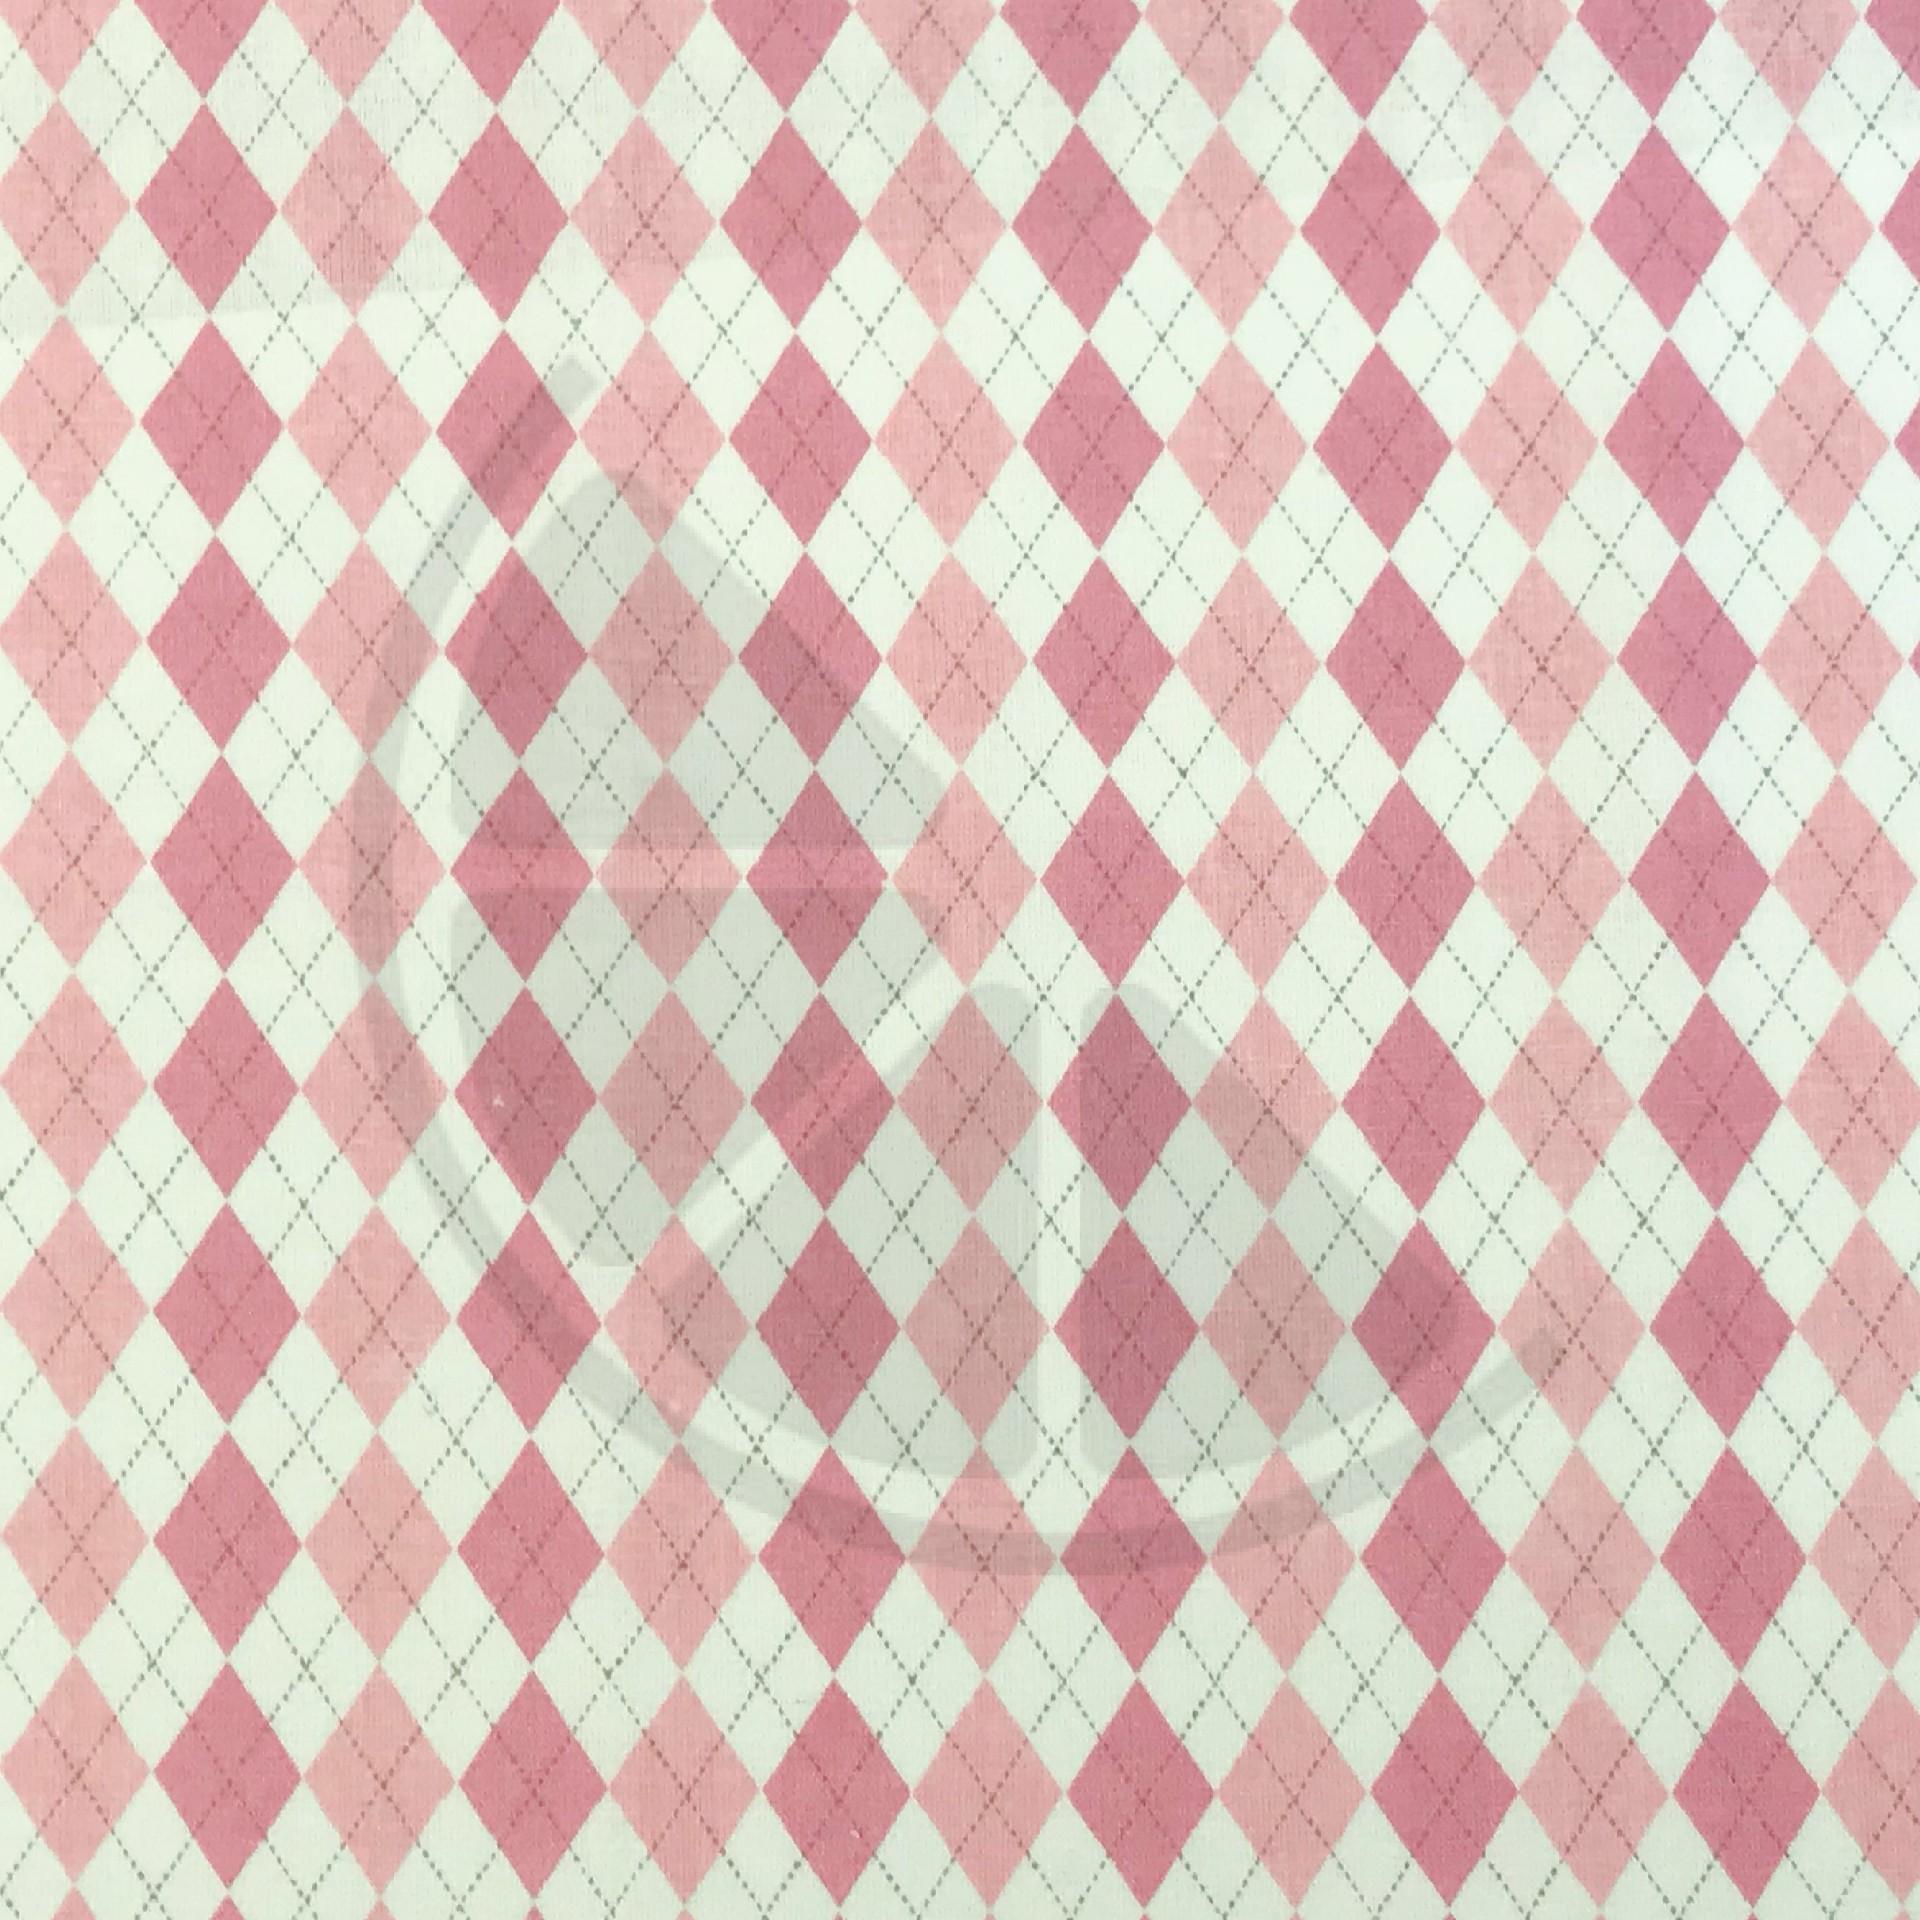 Balões Anita Catita - Xadrez em rosa